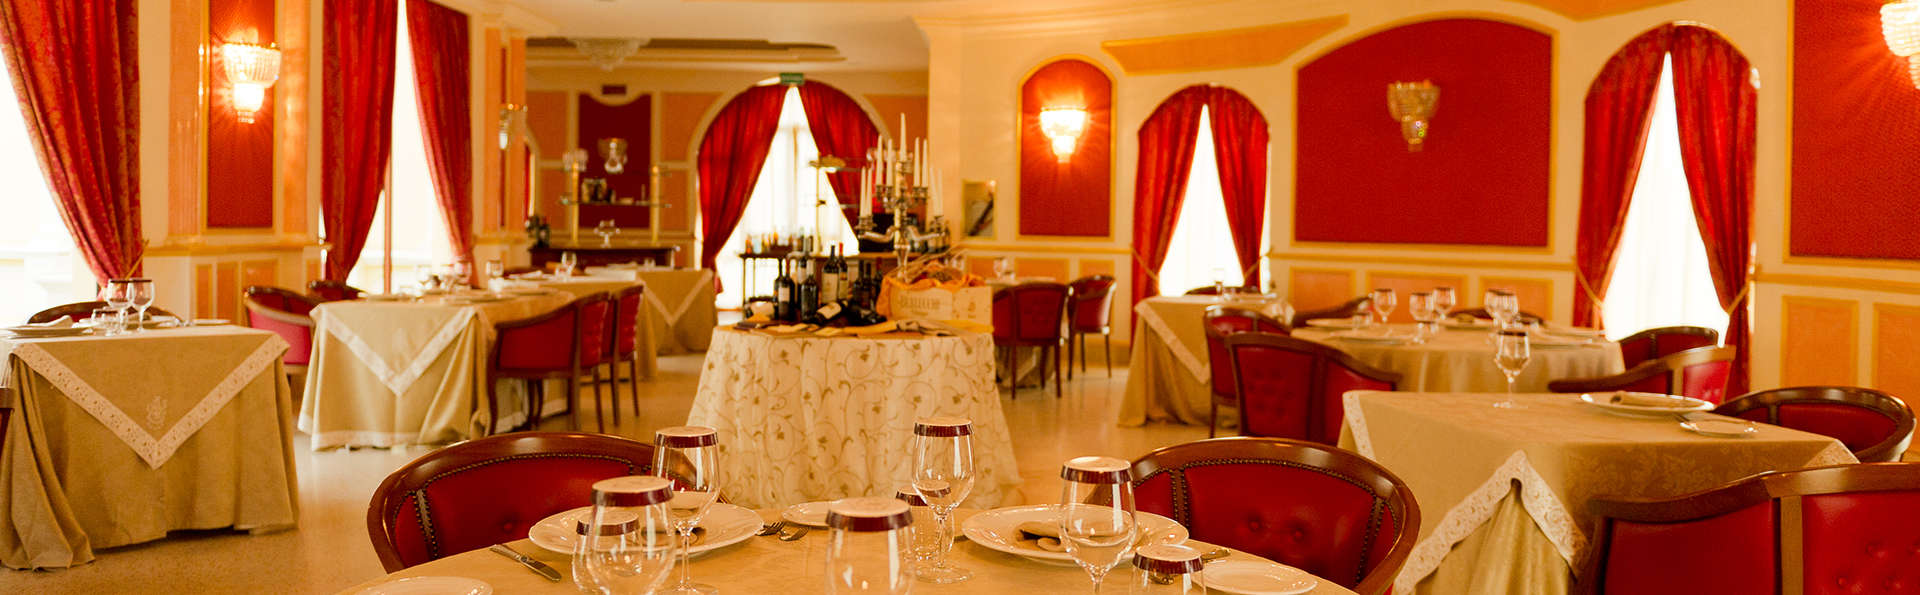 Parco dei Principi - edit_restaurant2.jpg